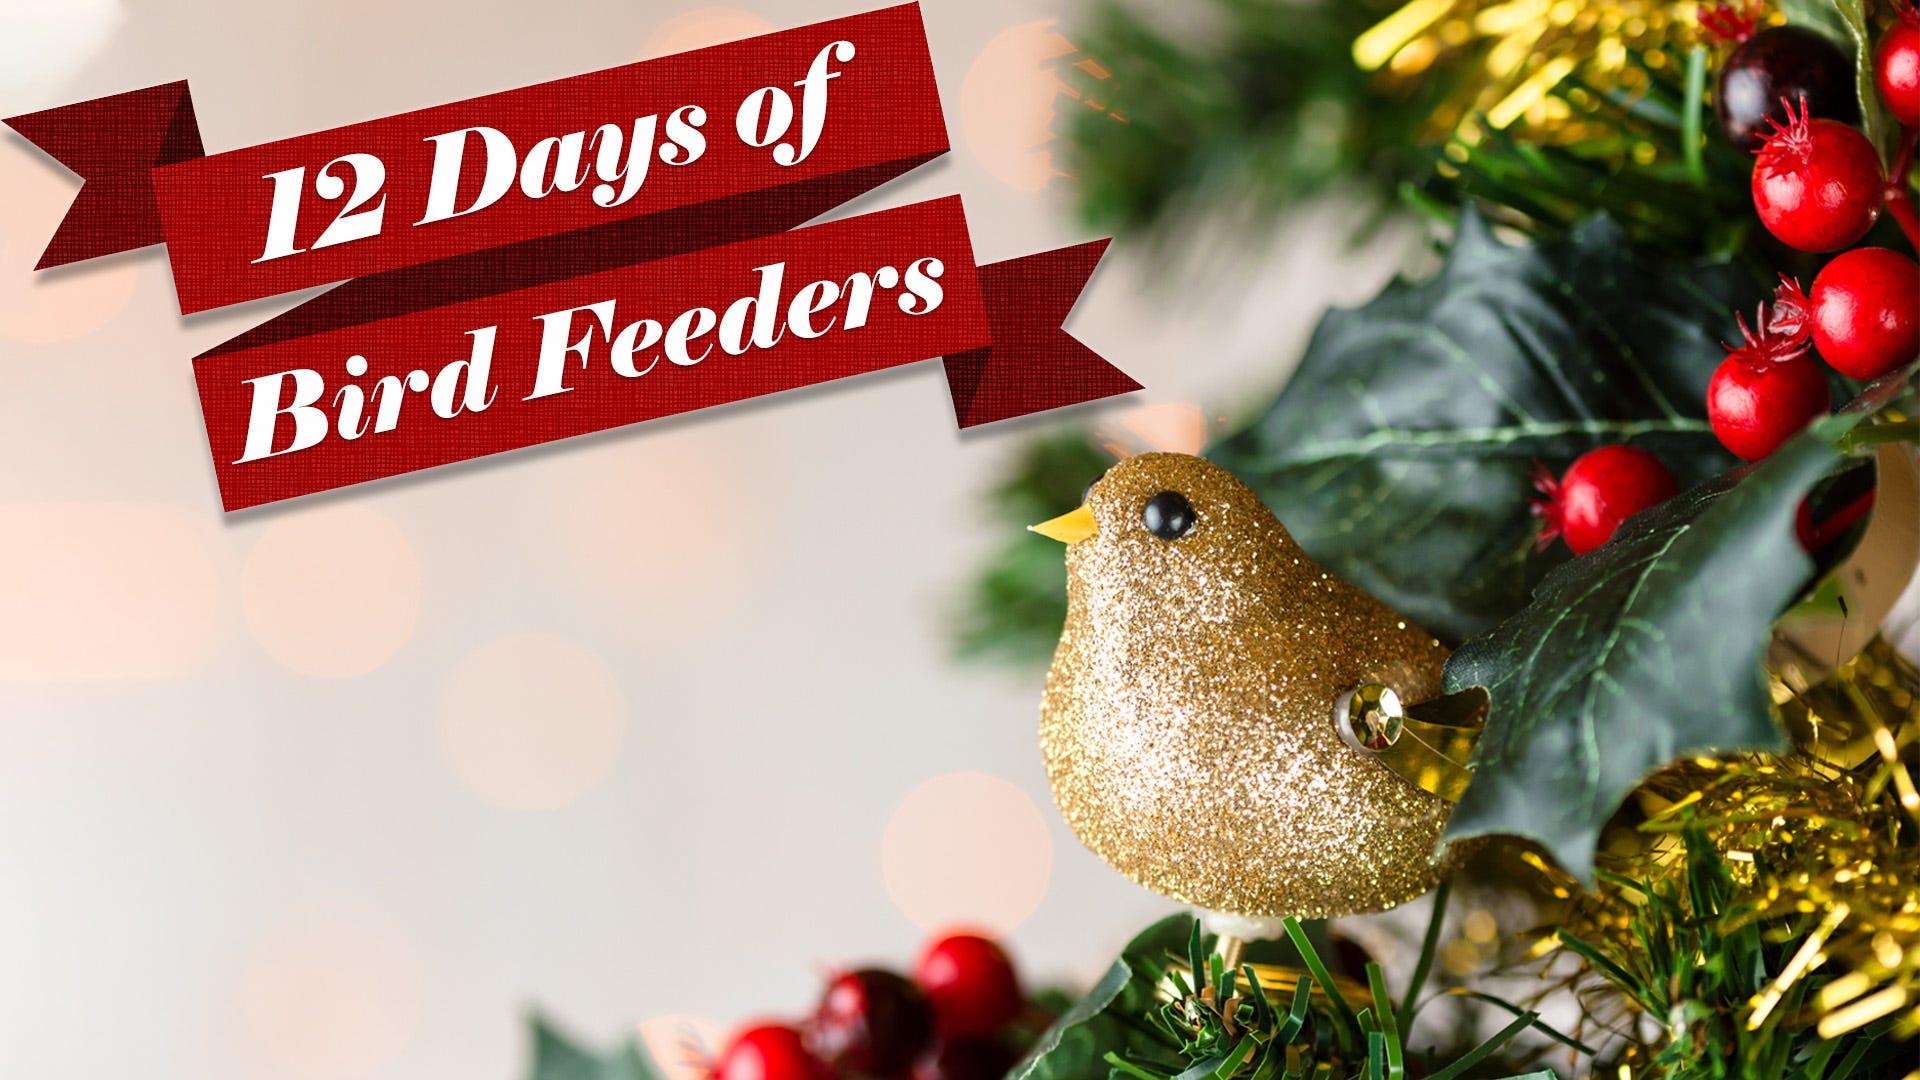 12 Days of Bird Feeders